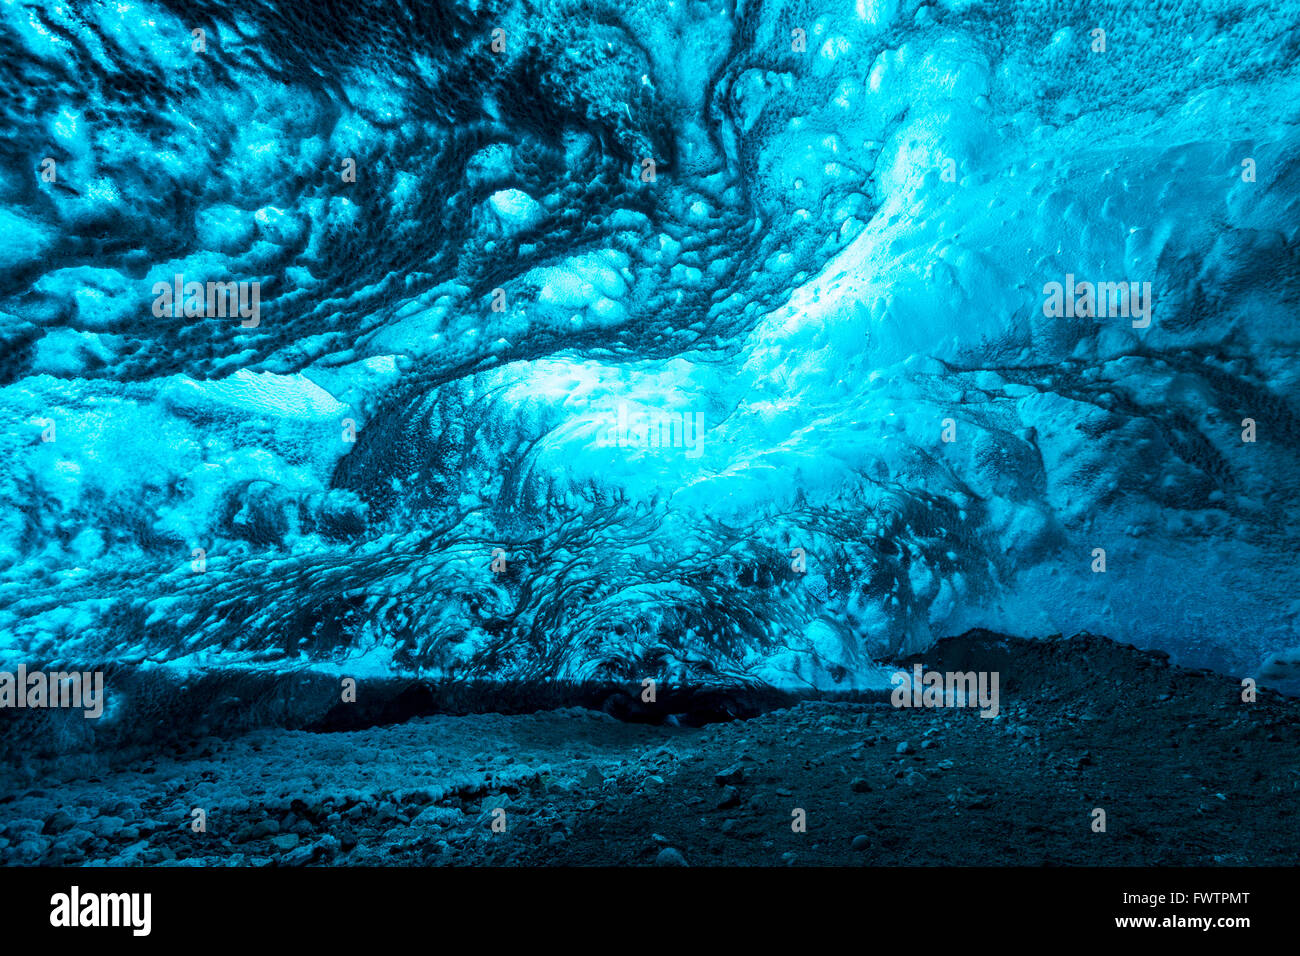 Ice Cave at Vatnajokull Glacier Jokulsarlon Iceland - Stock Image